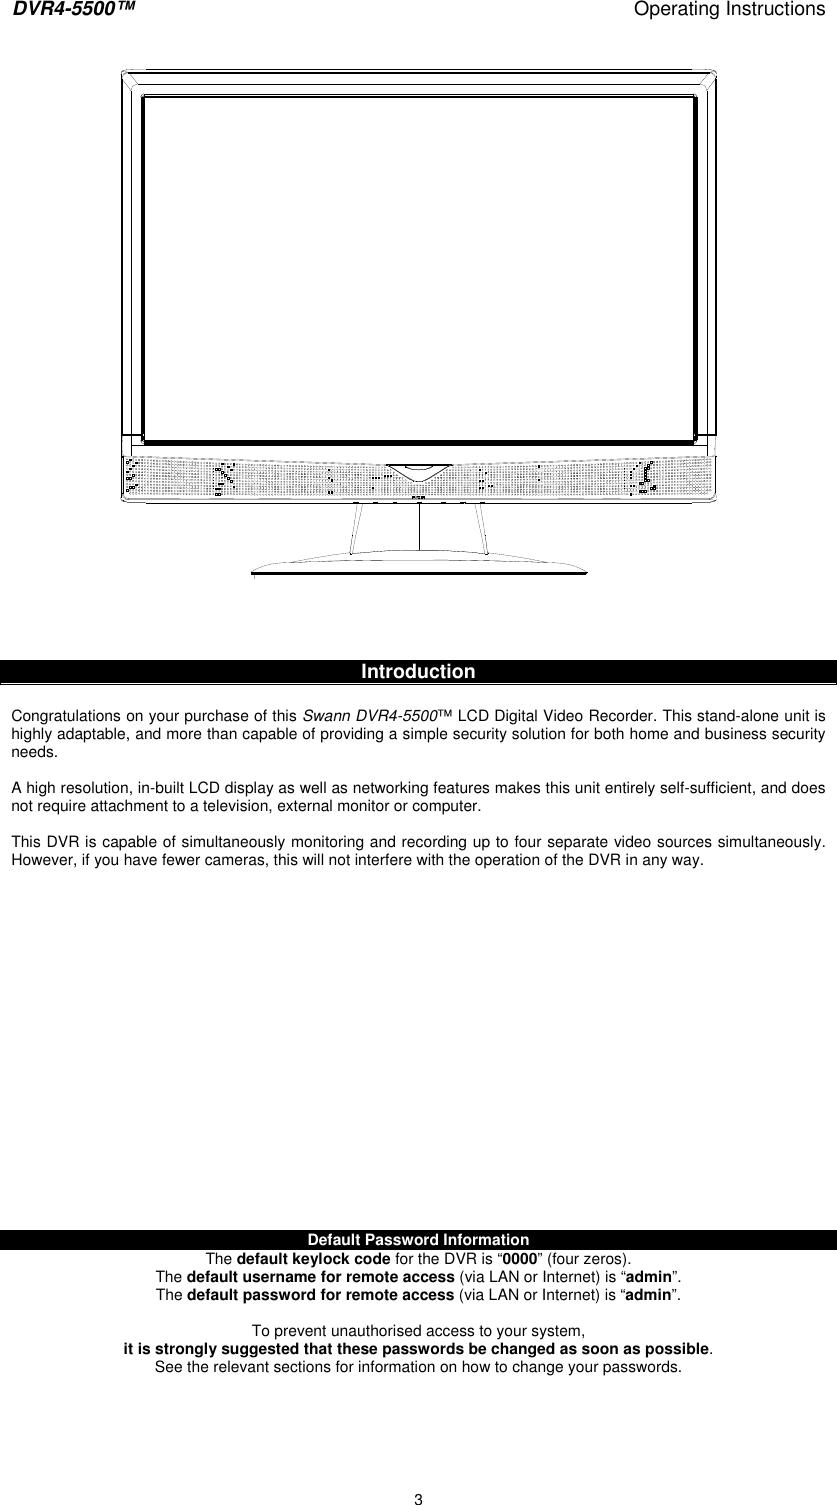 Swann Dvr4 5500 Users Manual LCD DVR